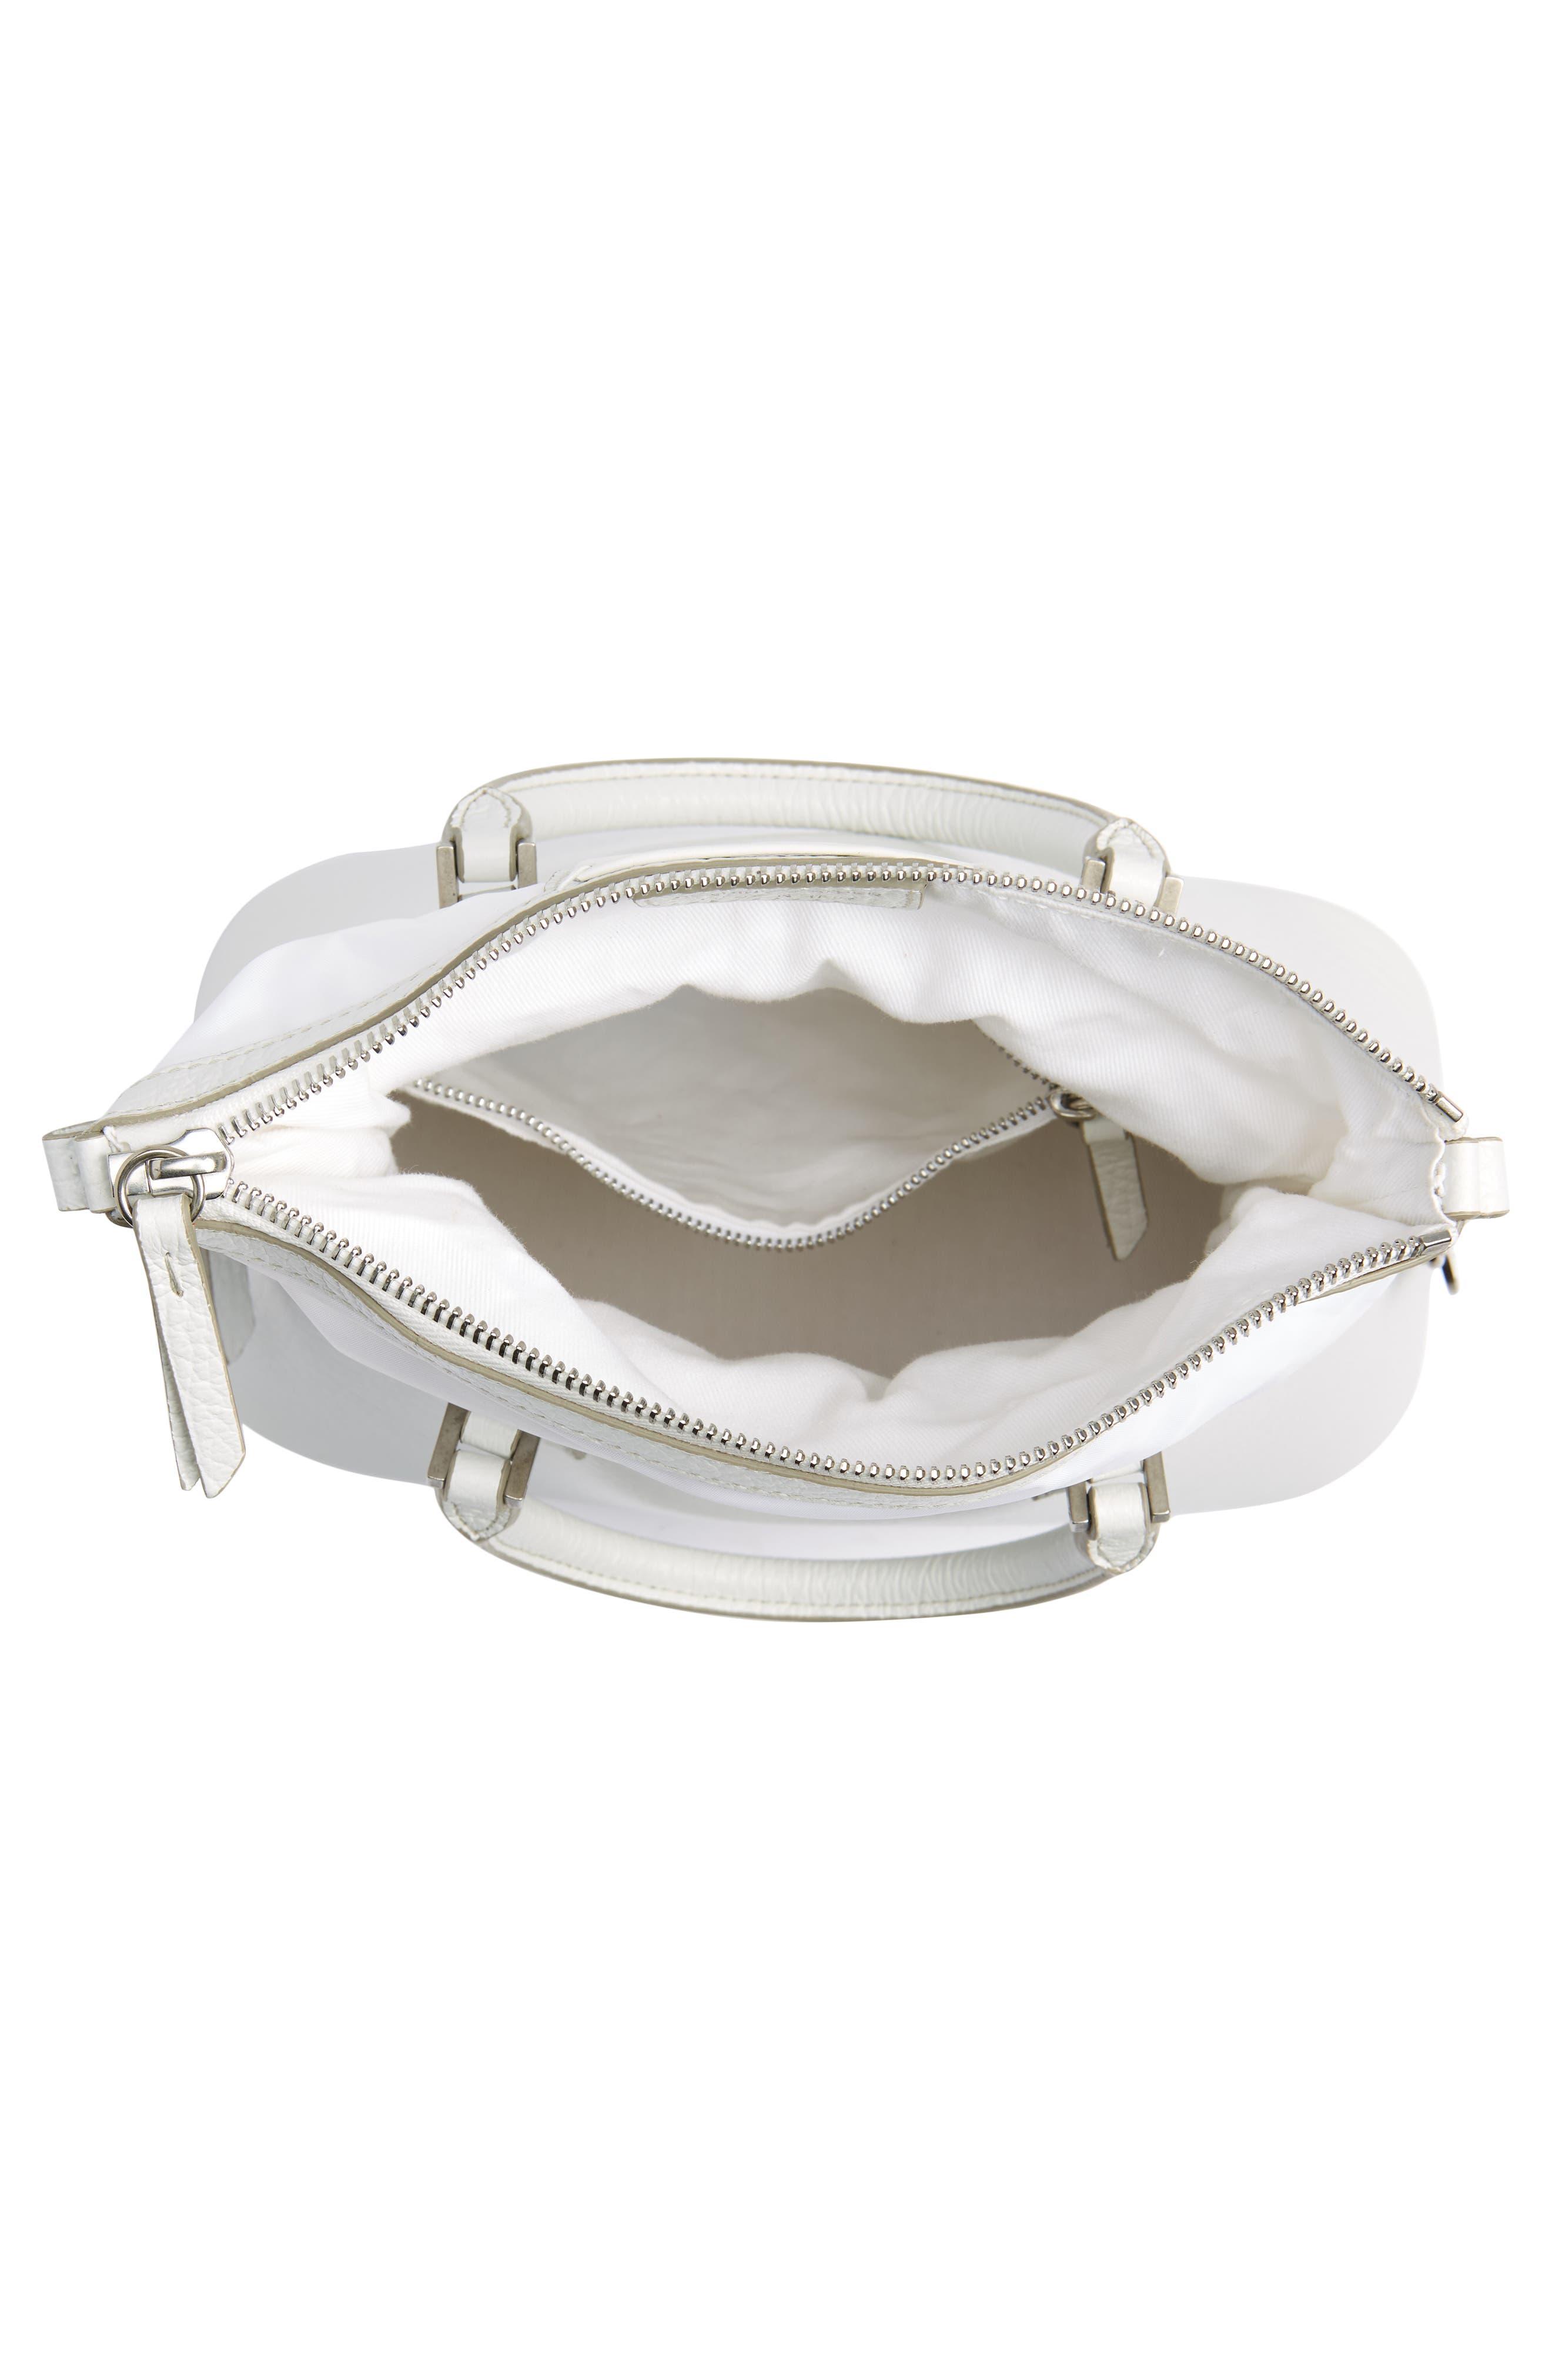 Small 5AC Calfskin Leather Handbag,                             Alternate thumbnail 5, color,                             WHITE